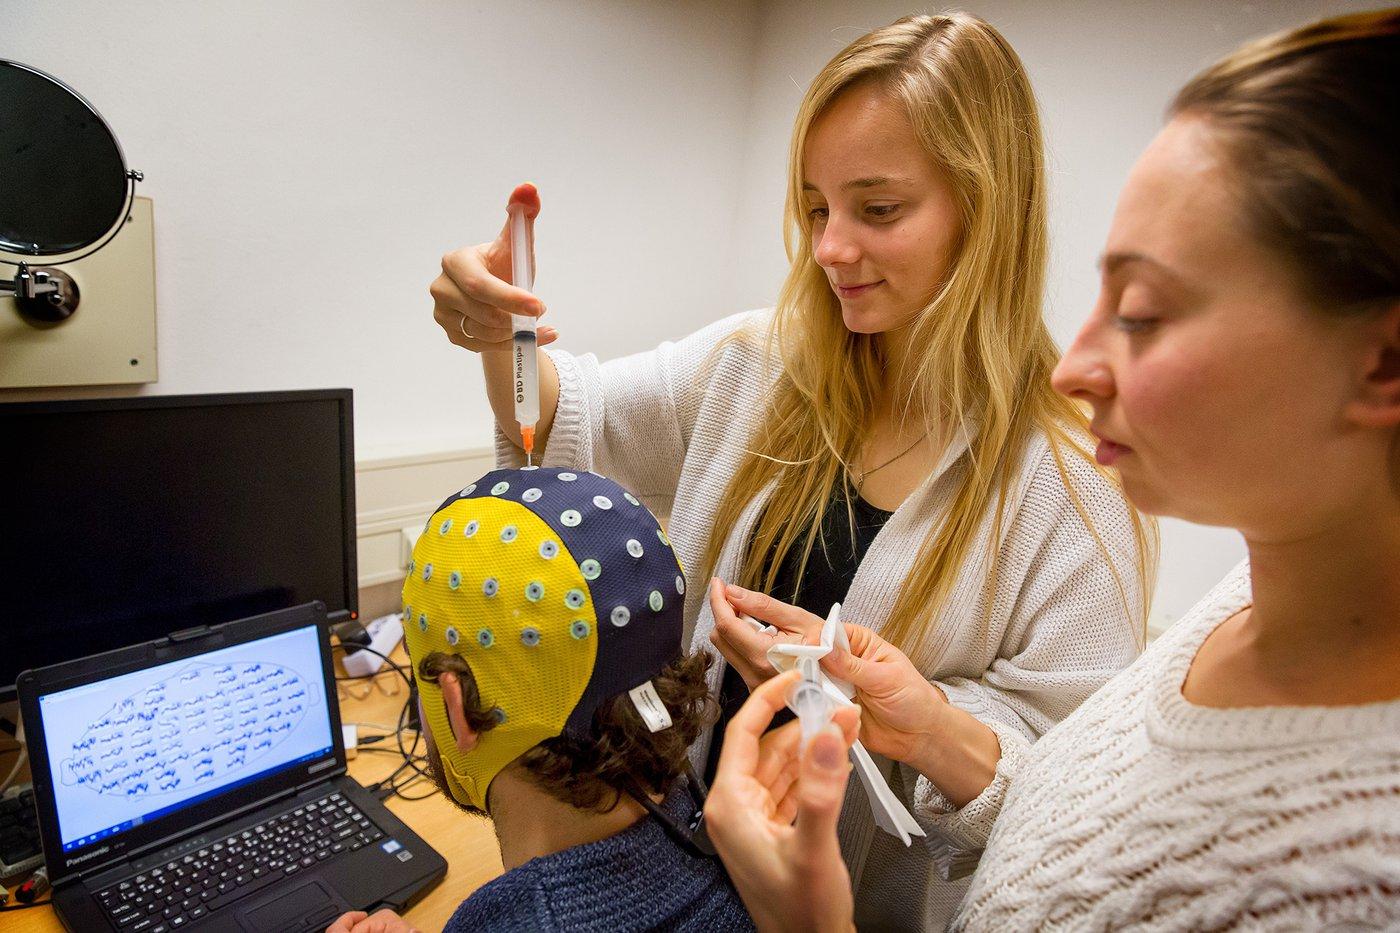 Radboud University - research